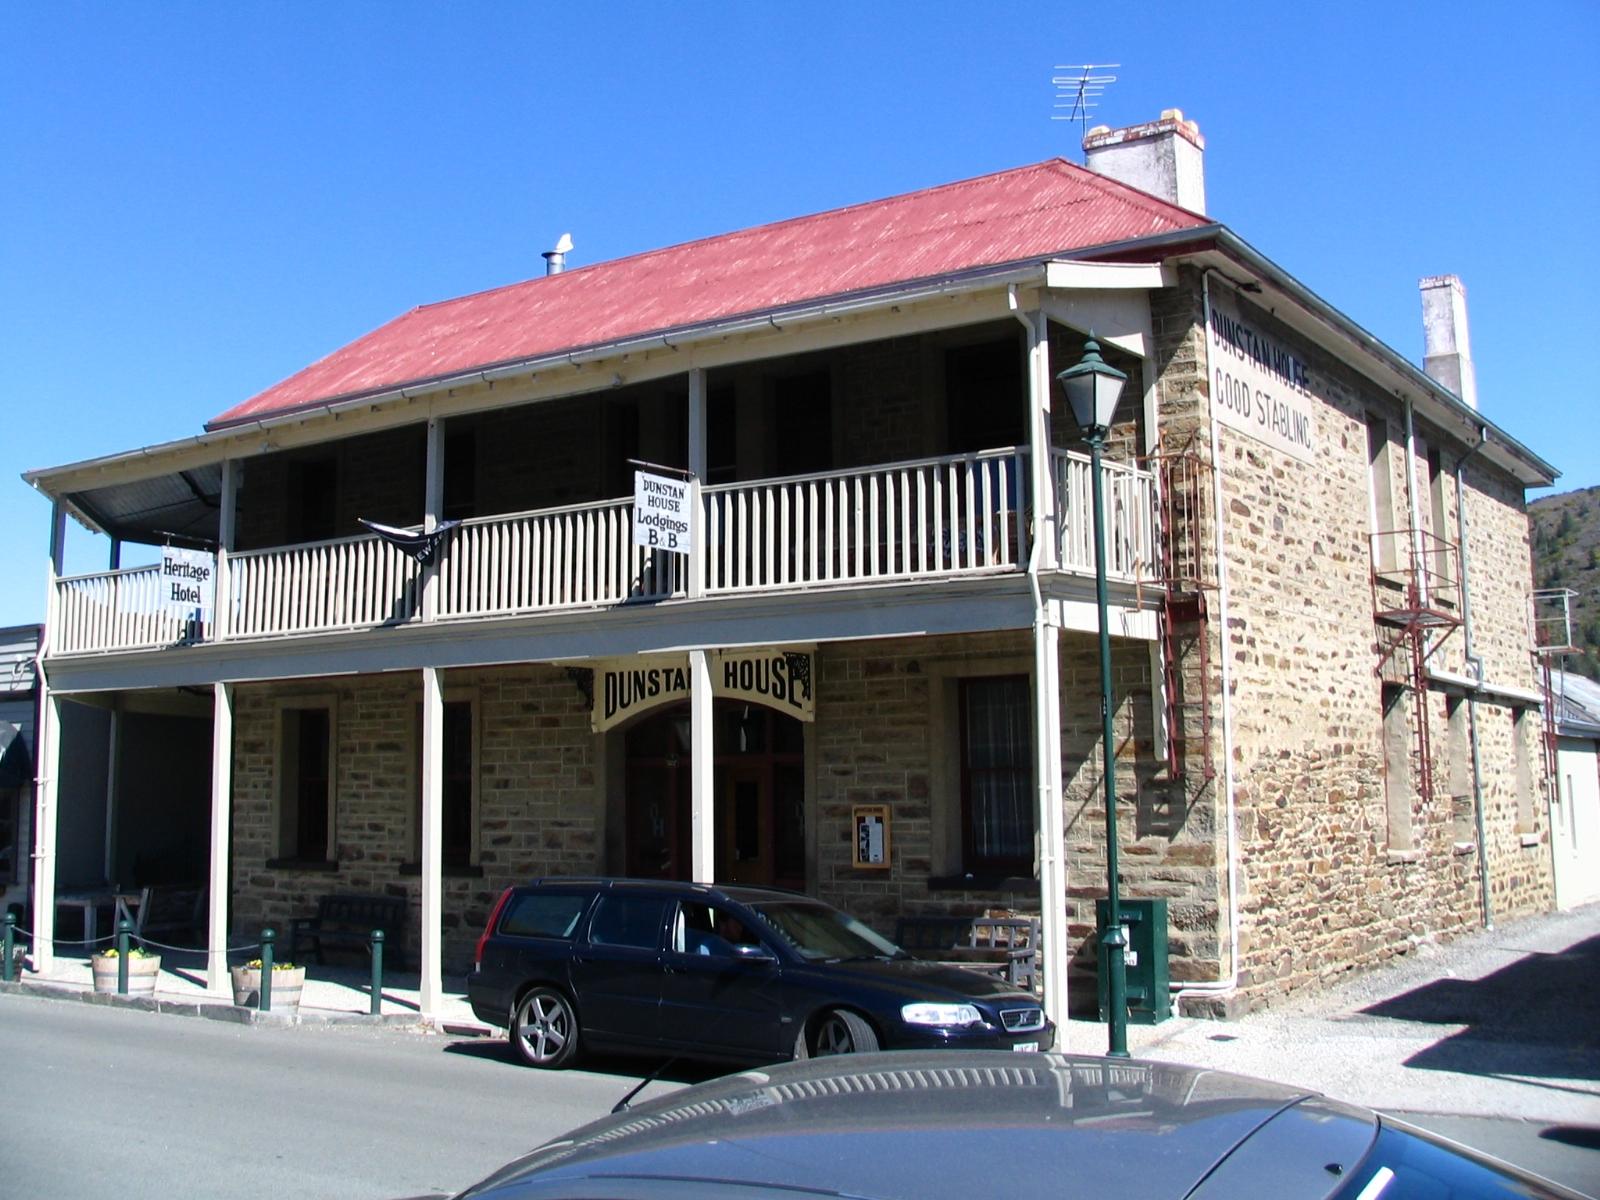 File:Former Dunstan Hotel Clyde, Otago, New Zealand 2368.jpg